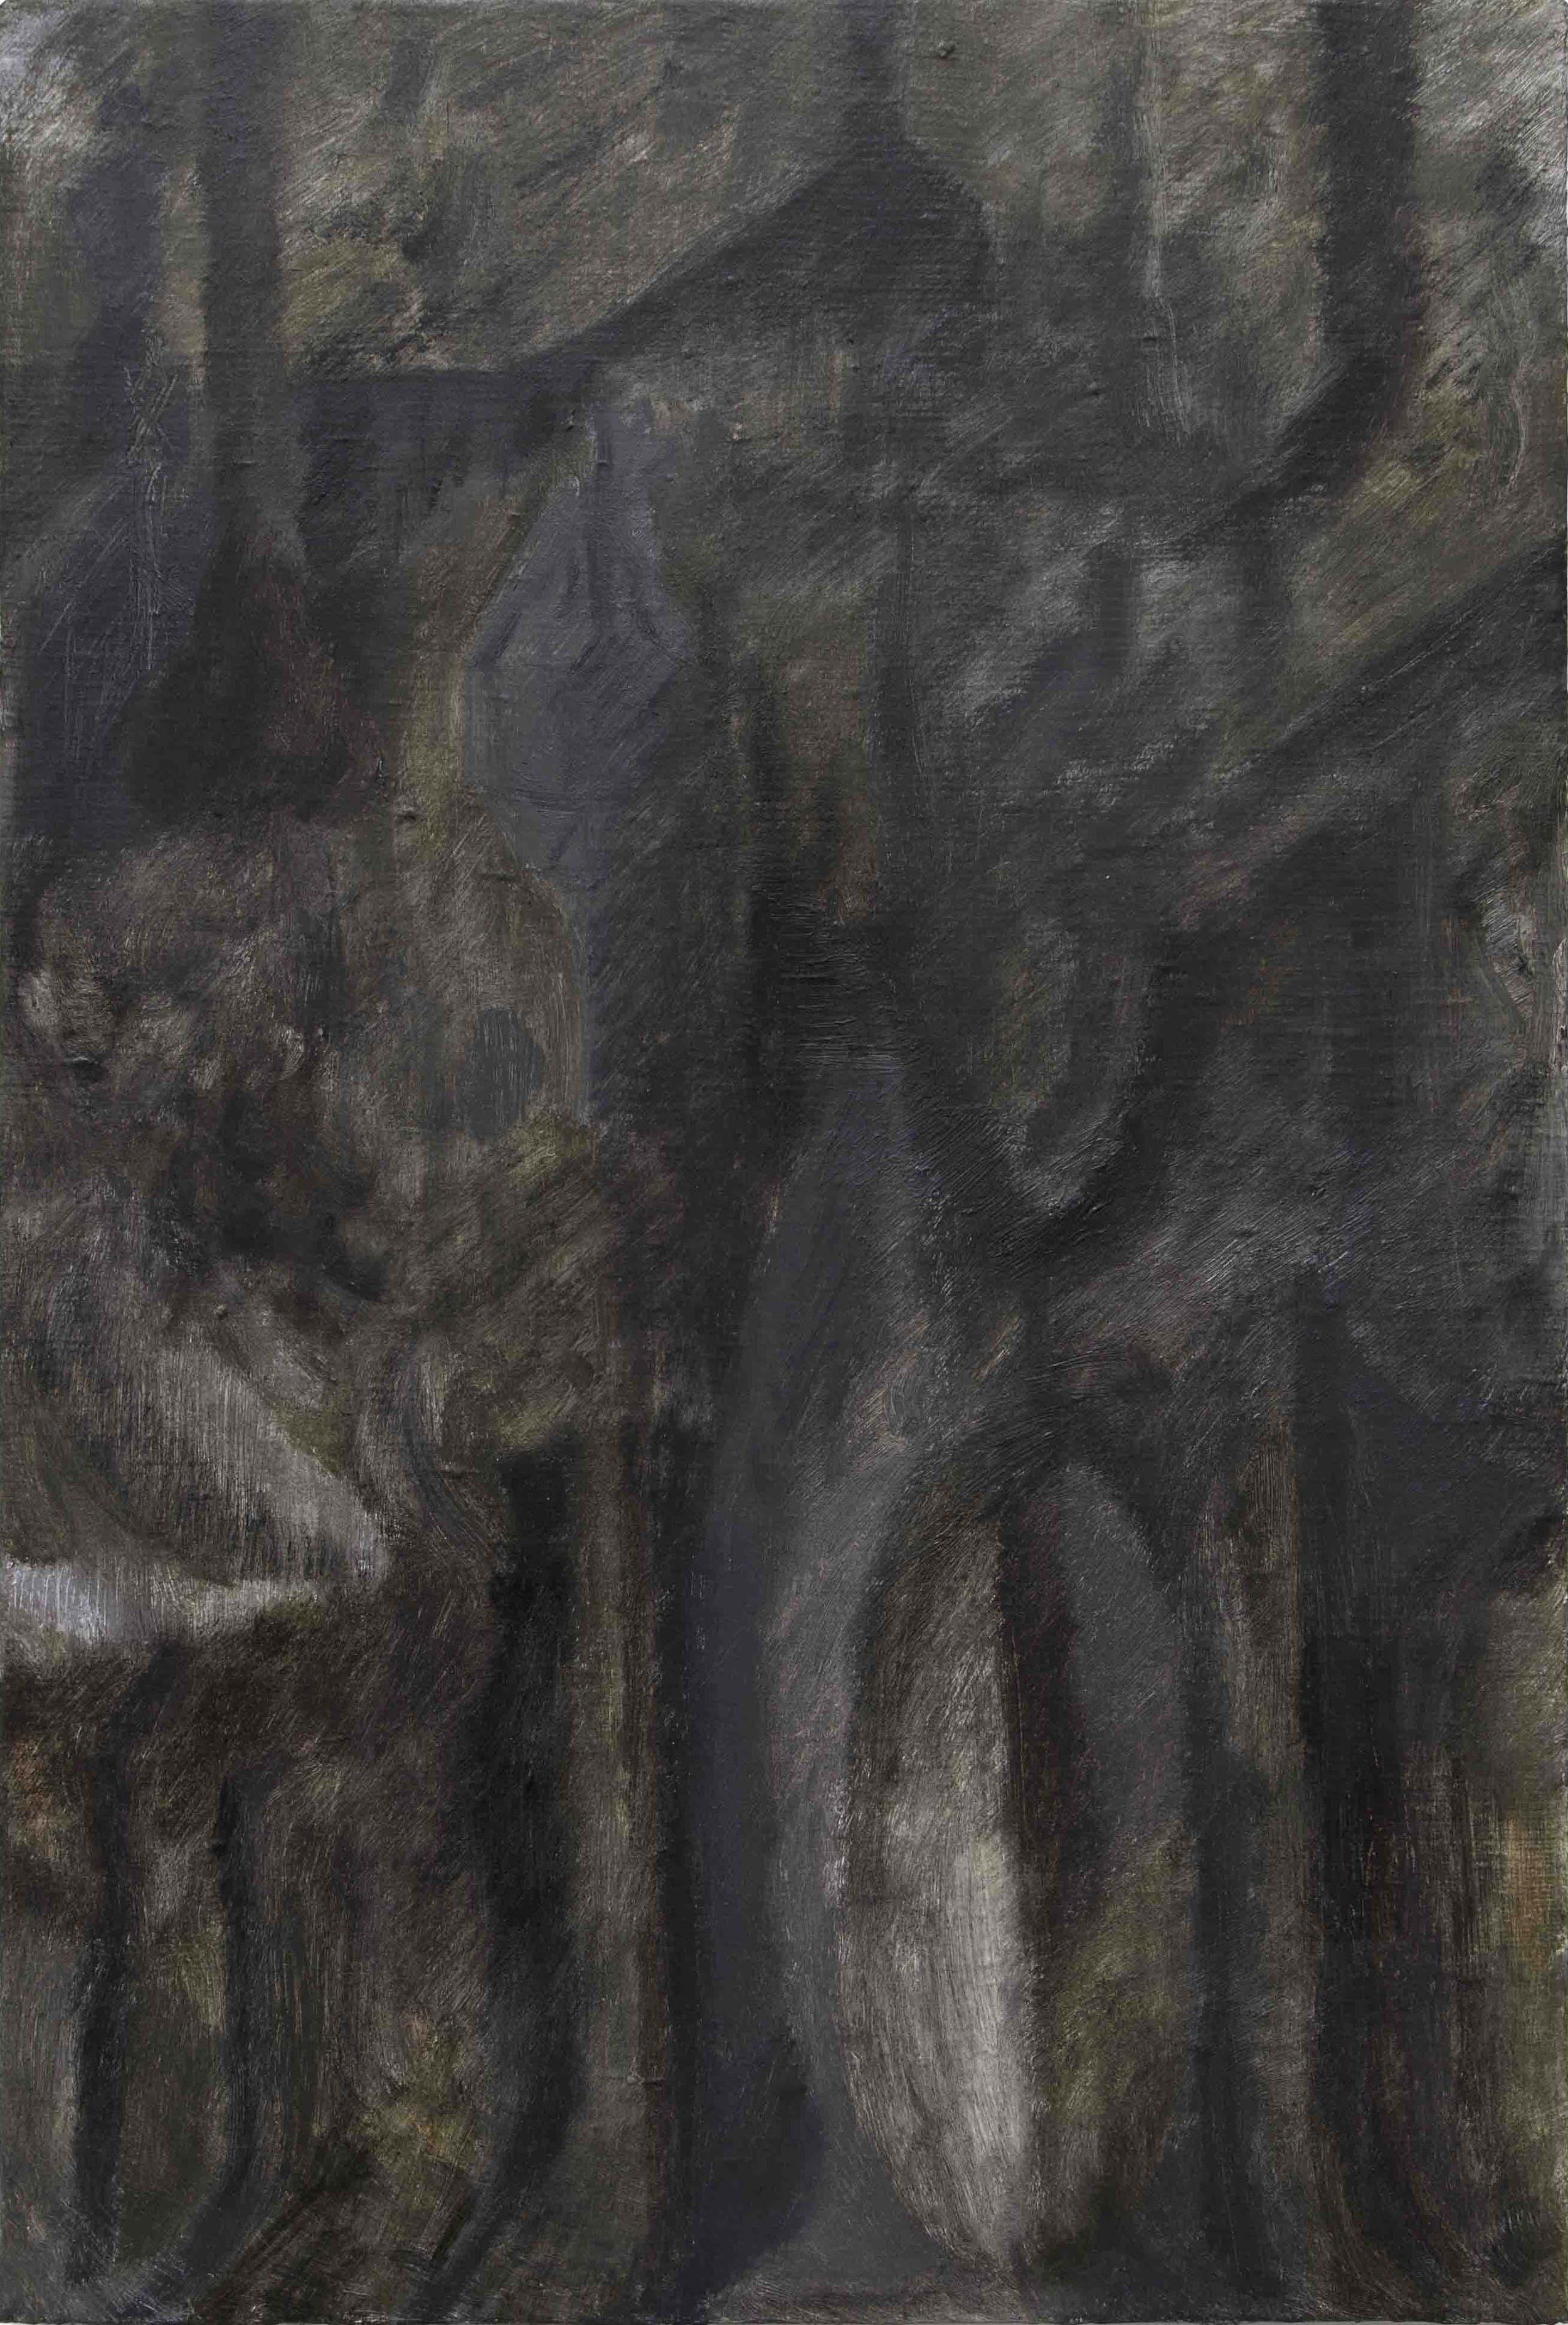 Tim Buckovic, Atelier, 2017, oil on linen, 46 x 30.5 cm